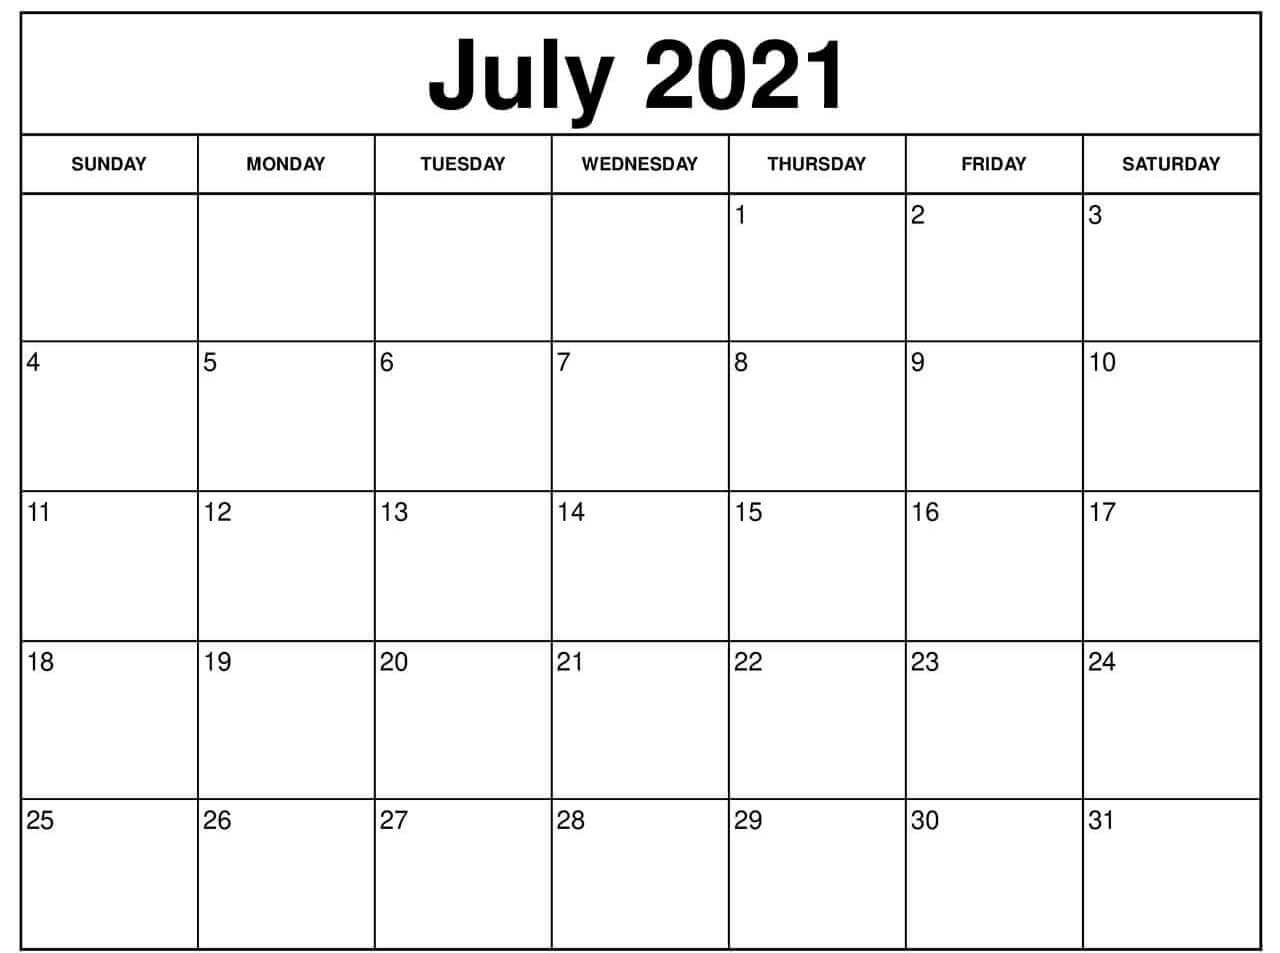 Calendar For July 2021 Printable